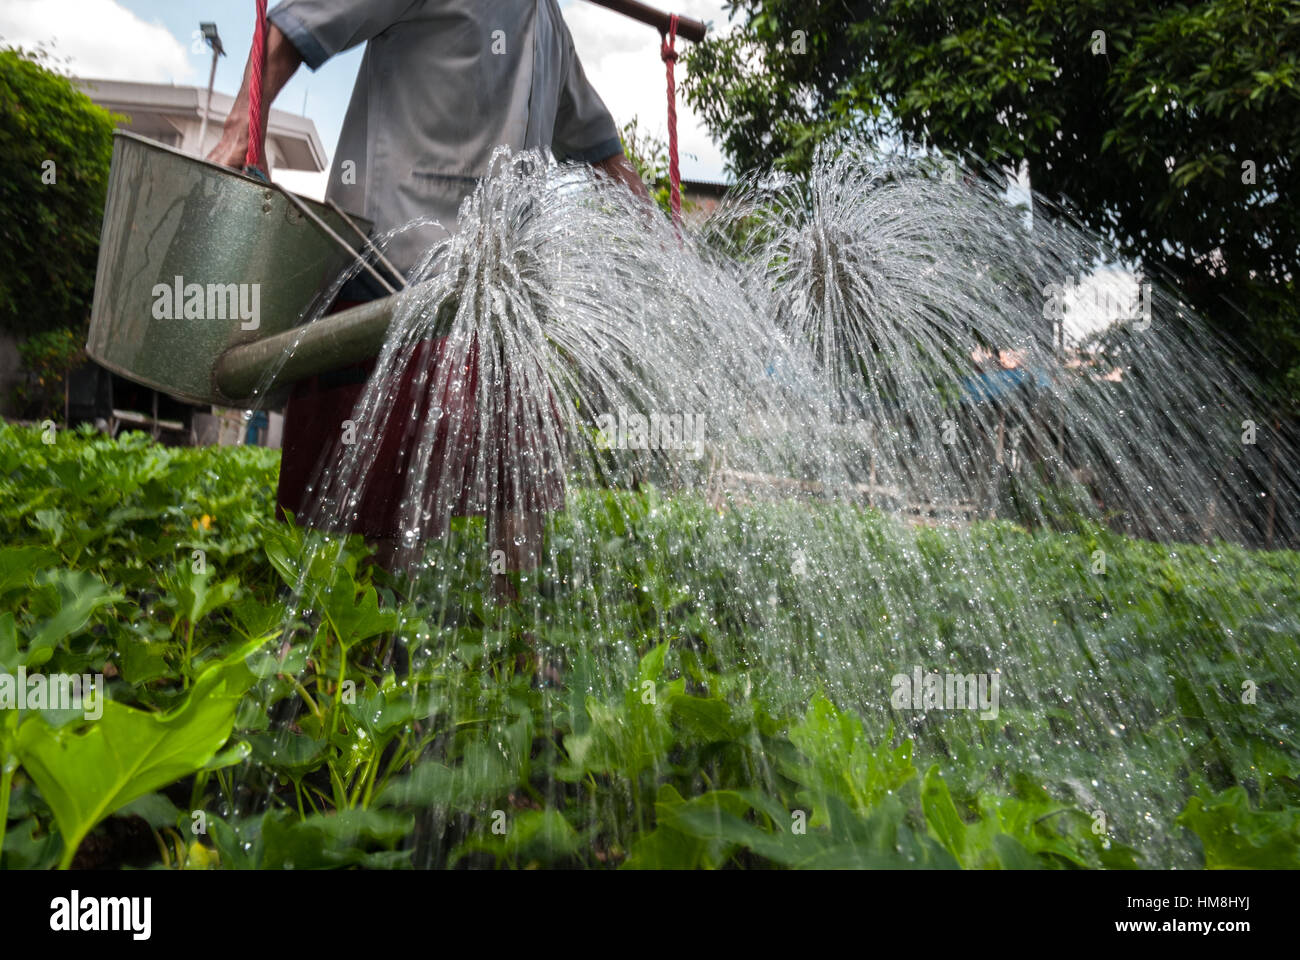 Uomo impianti di irrigazione in un quartiere residenziale di Jakarta, Indonesia. © Rinaldo Sumayku Immagini Stock